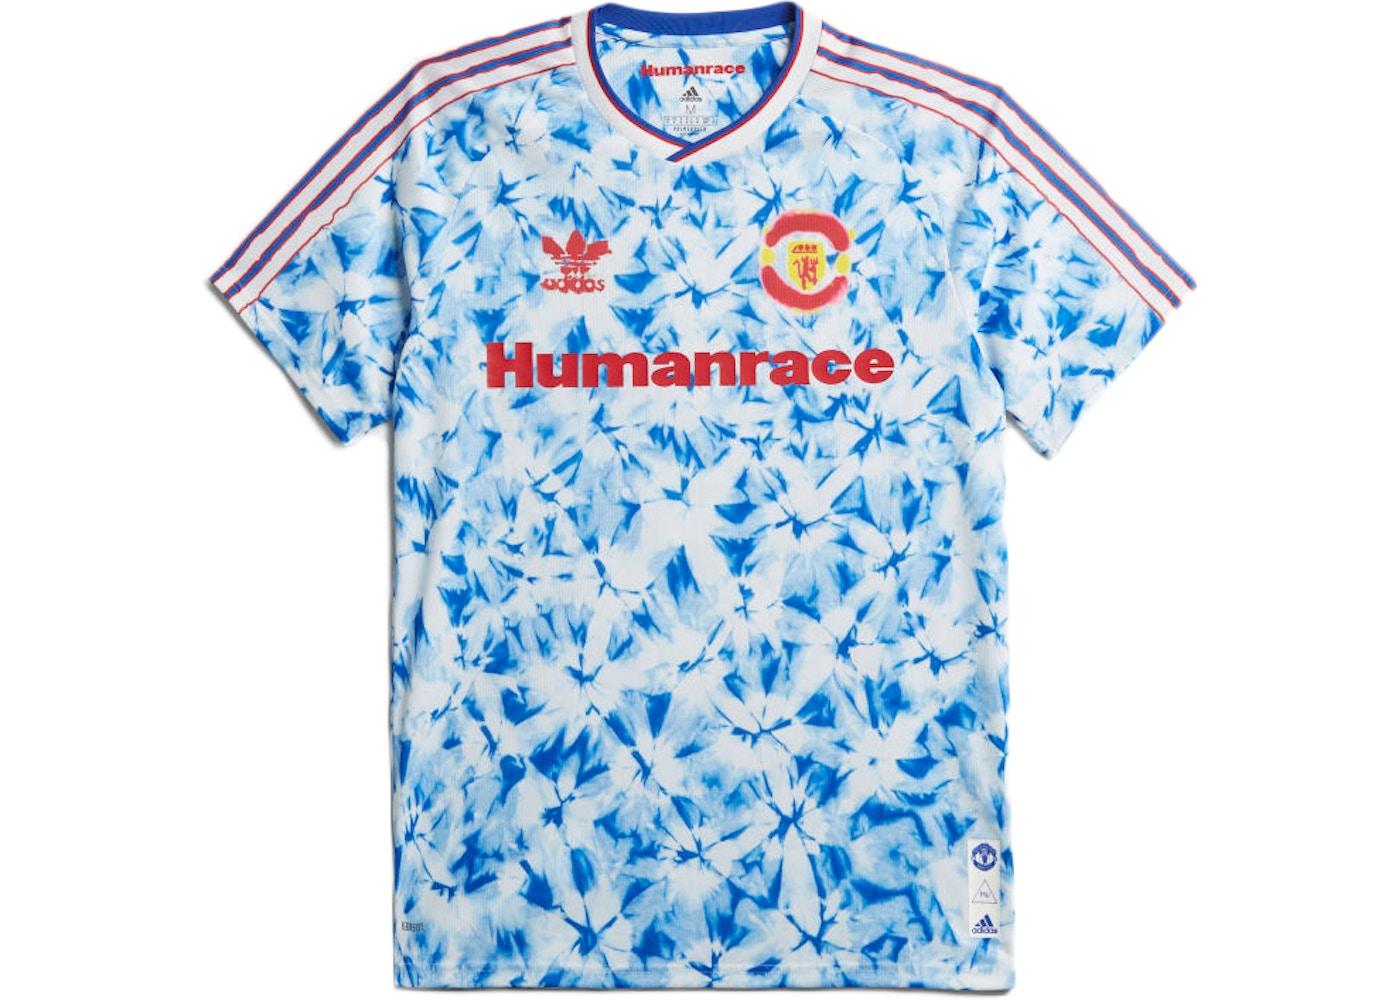 adidas Manchester United Human Race Jersey White/Bold Blue